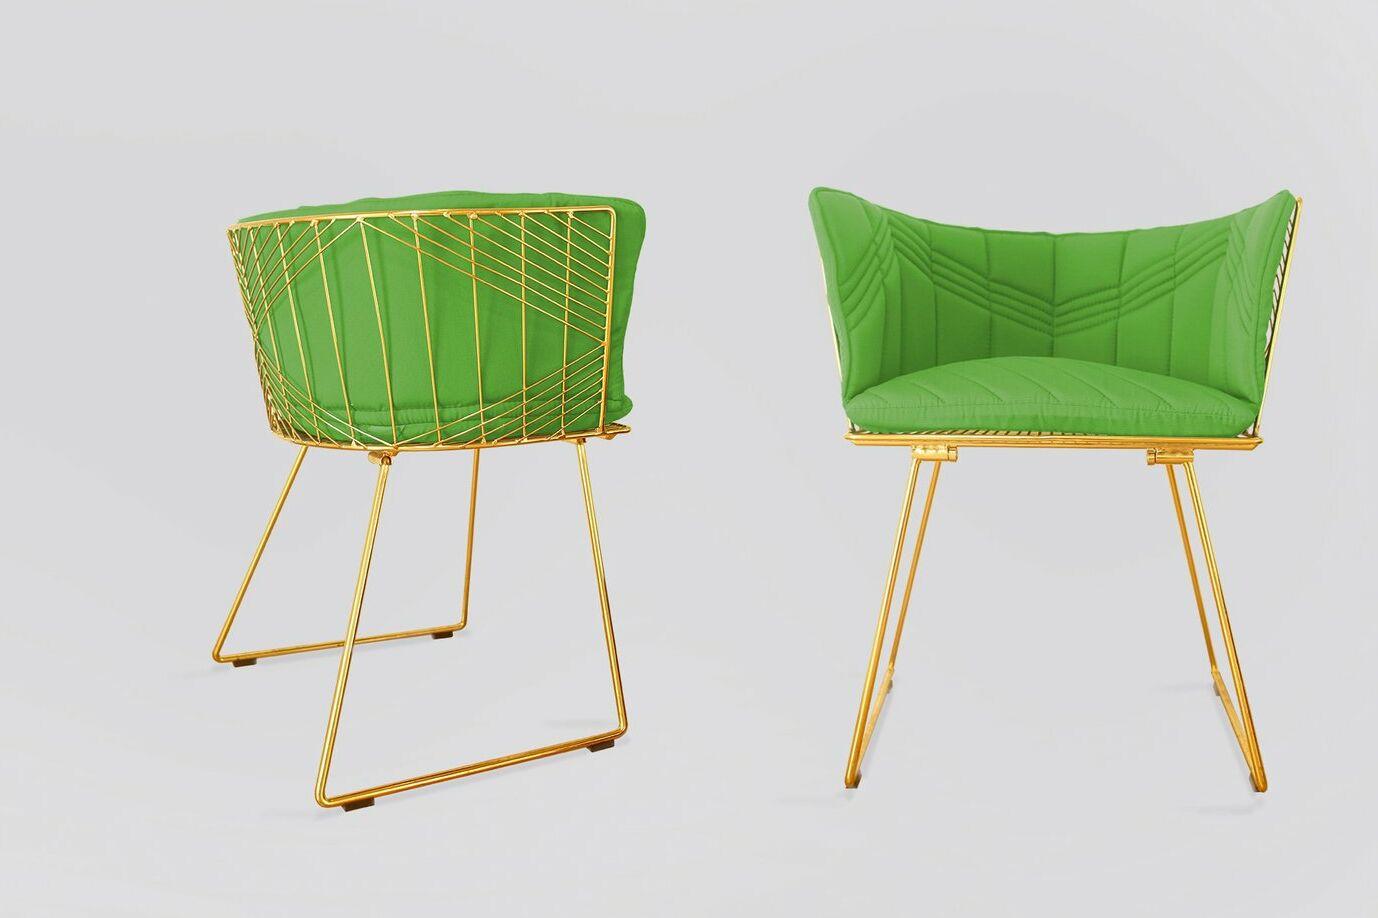 Captain Indoor/Outdoor Sunbrella Dining Chair Cushion Fabric: Macaw